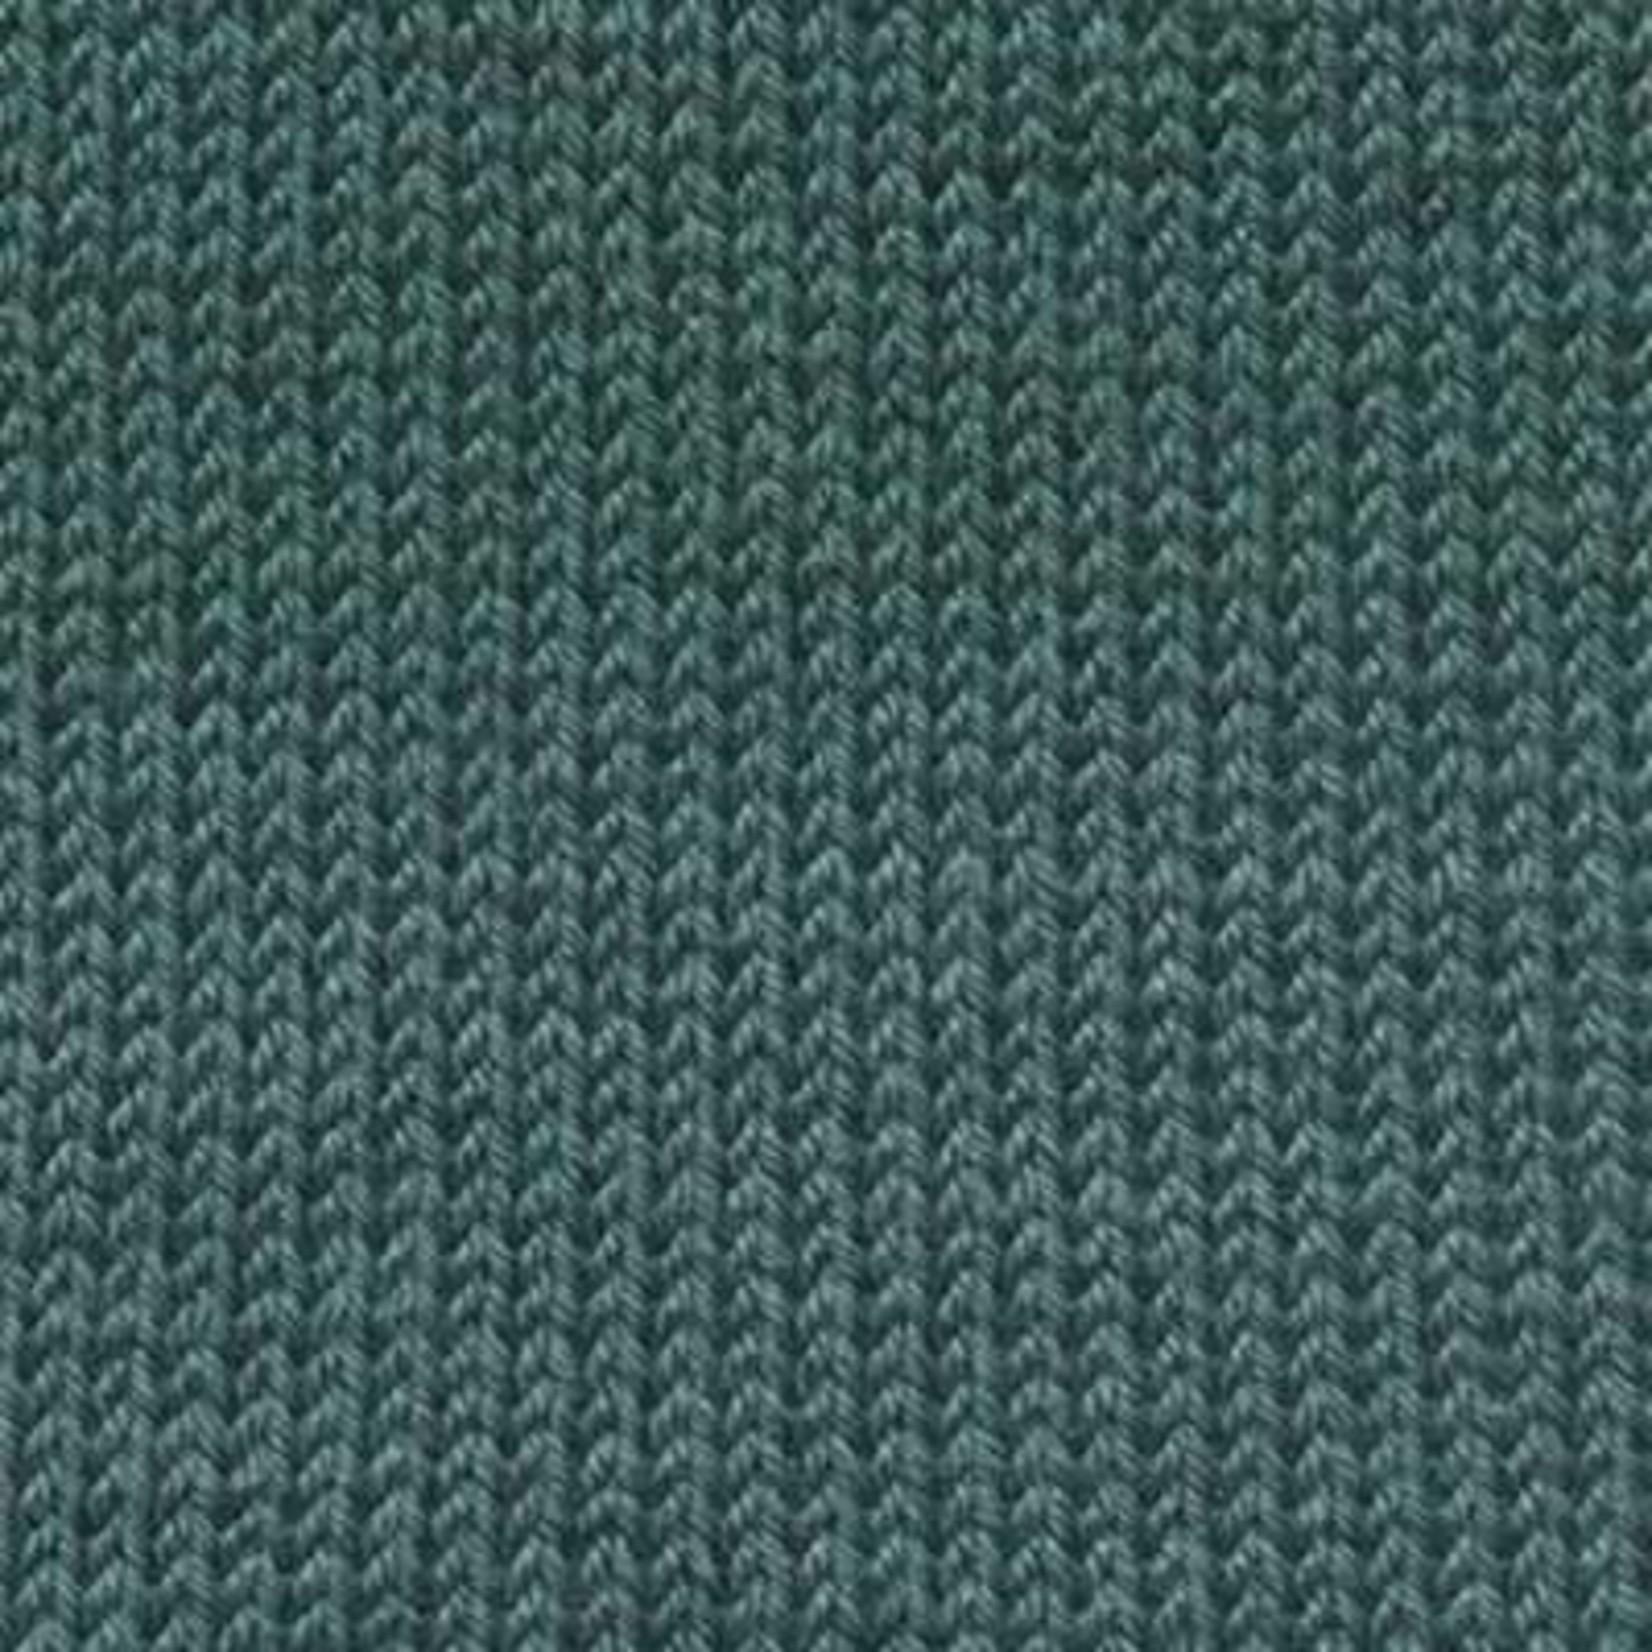 Lang Yarns Super Soxx Color Cashmere by Lang Yarns